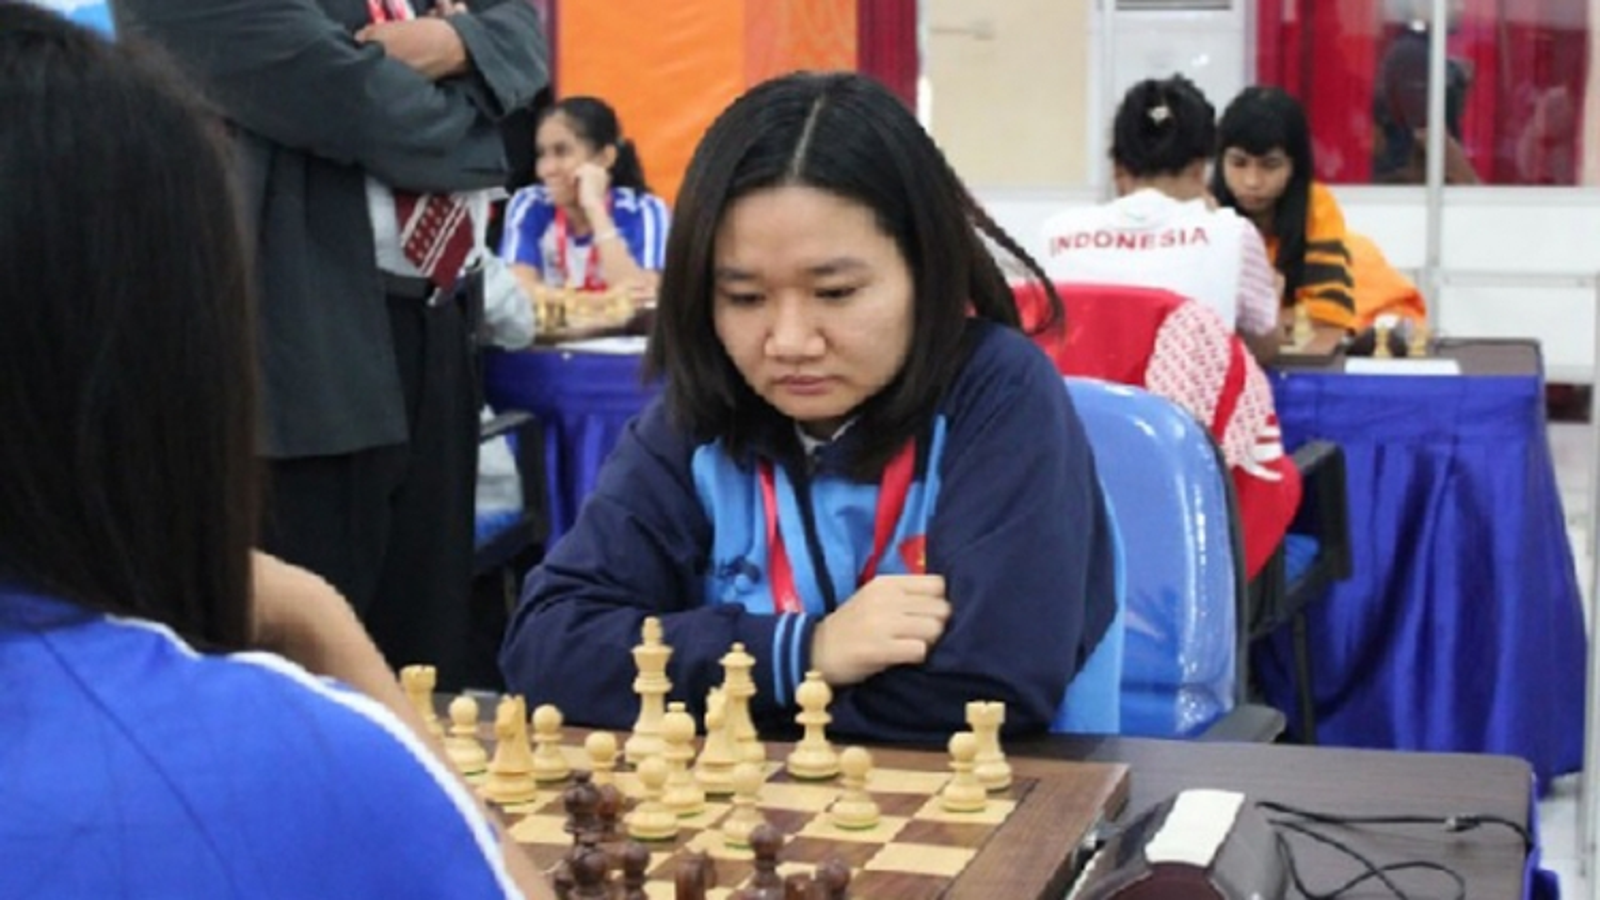 Vietnam to host first chess tournament for international grandmasters